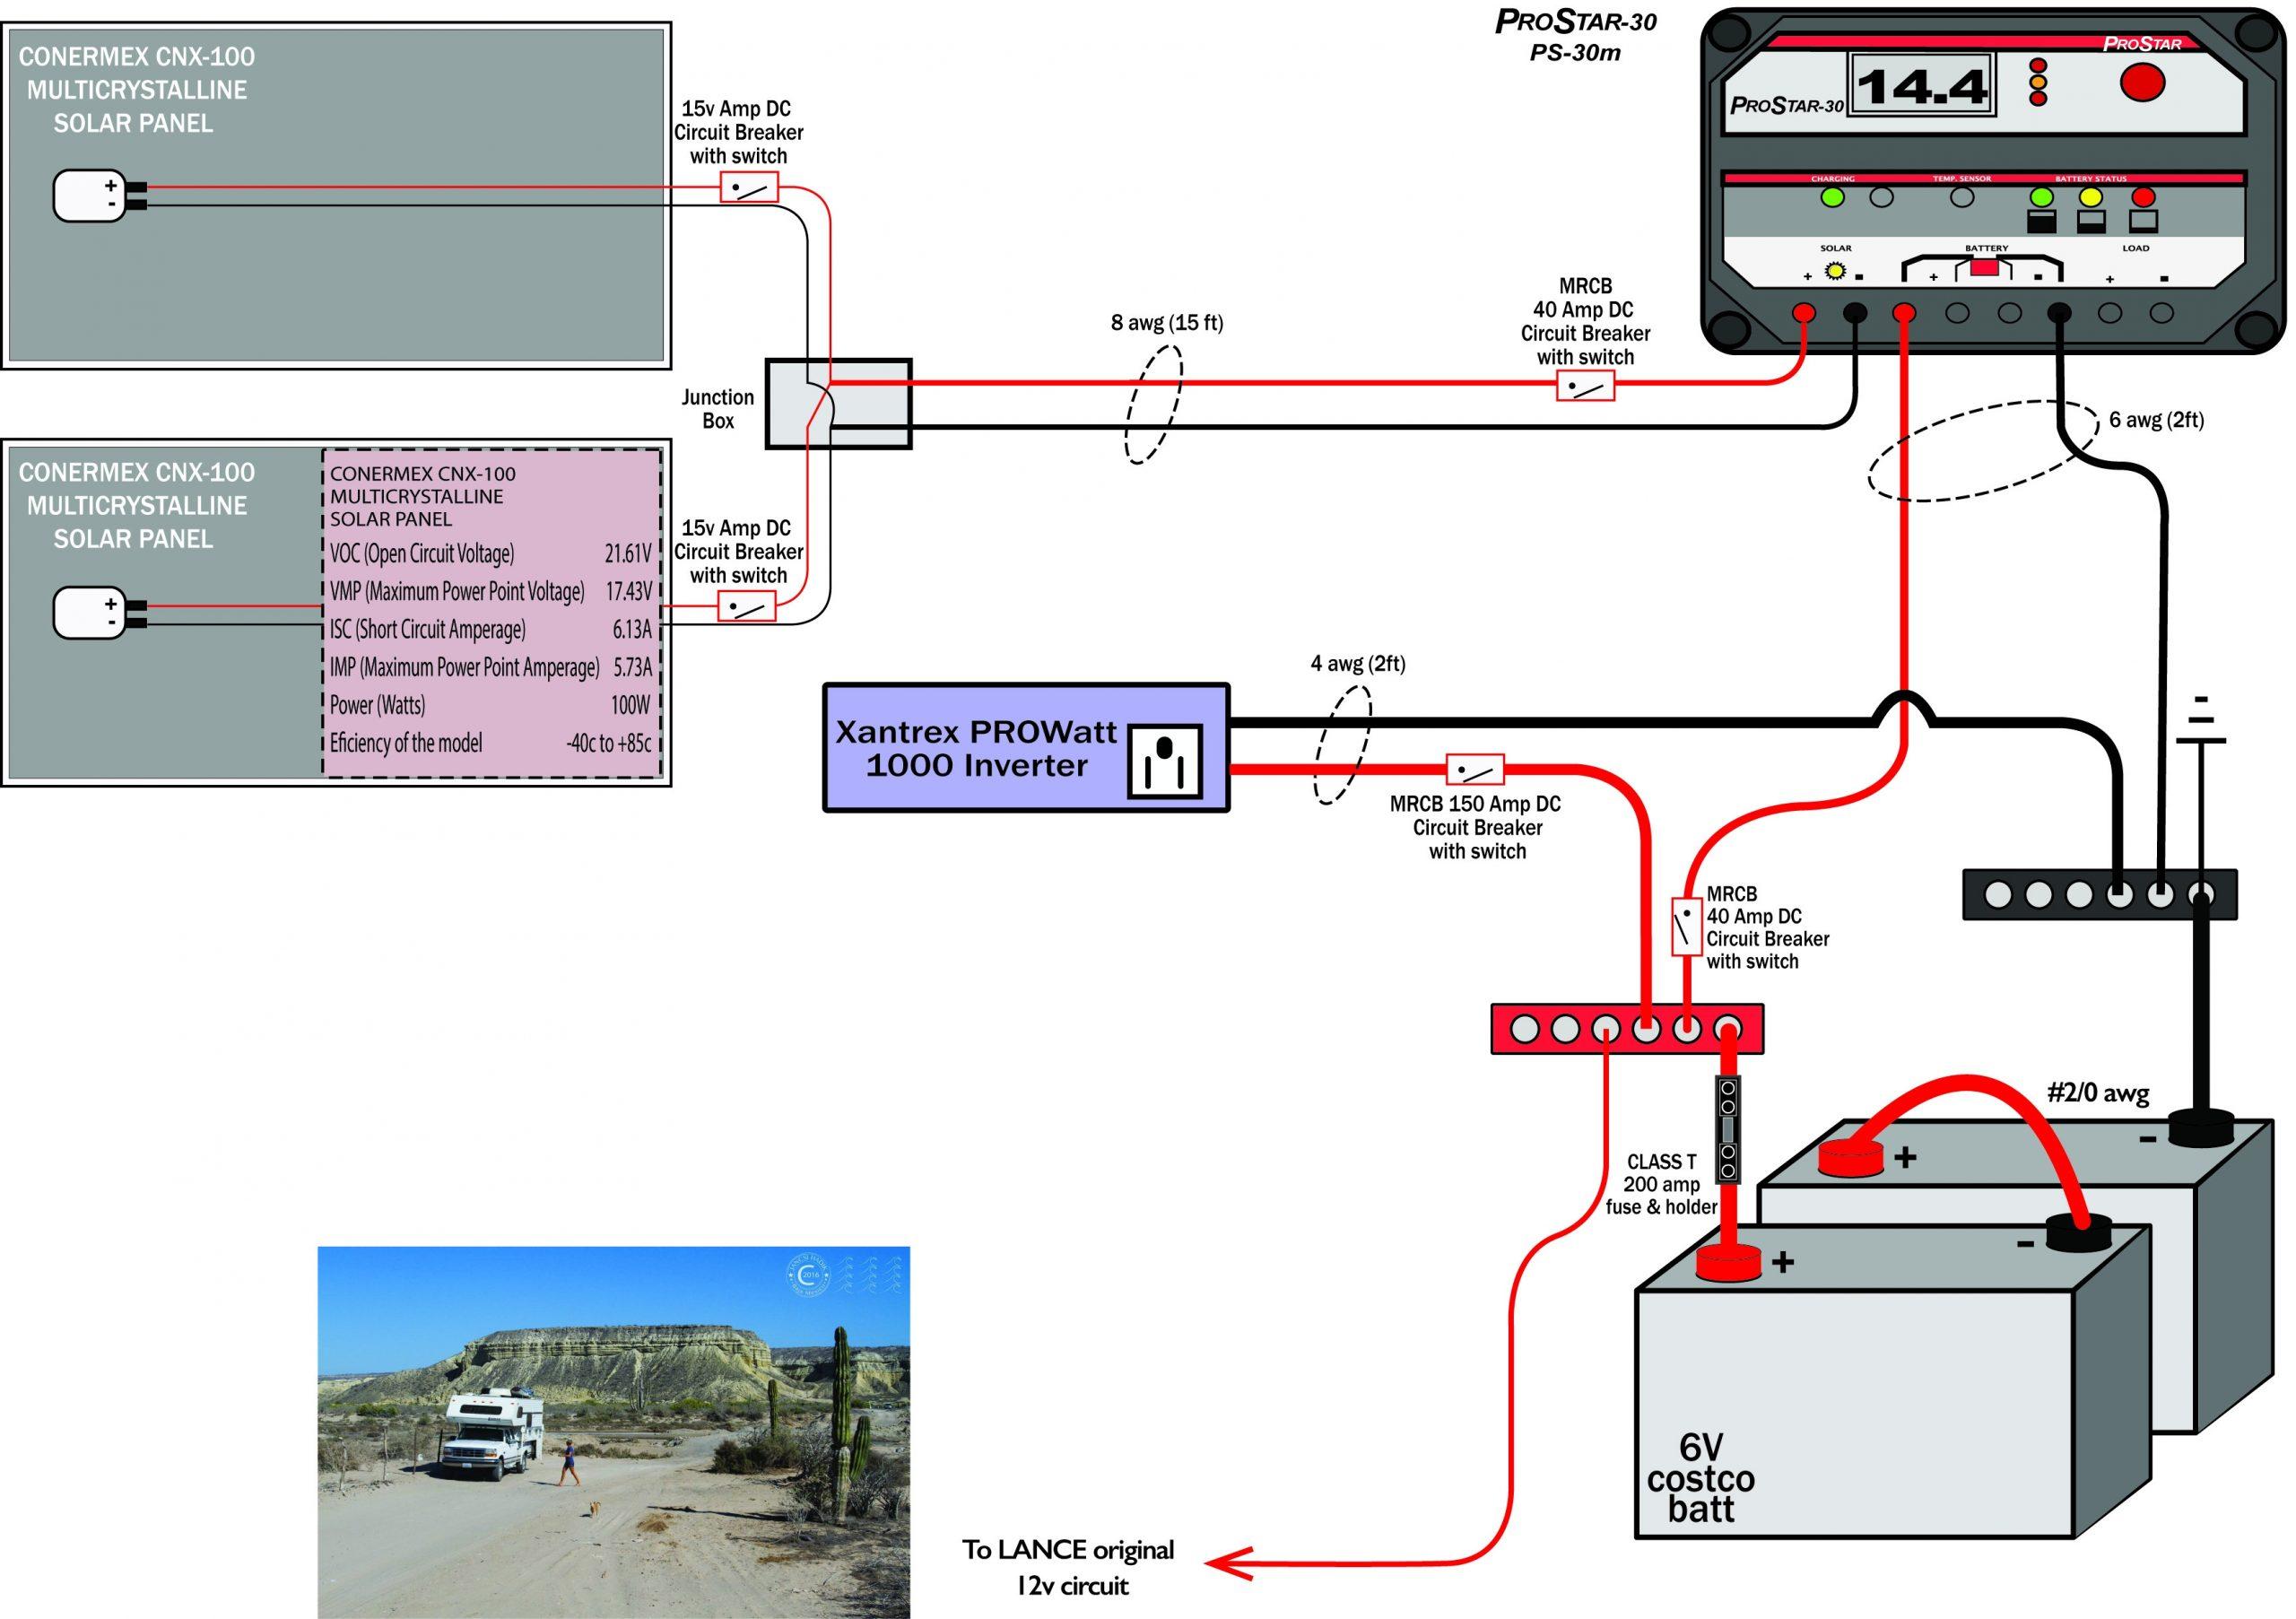 Truck Camper Wiring Diagram Newbie solar Truck Camper Setup — northernarizona-windandsun Of Truck Camper Wiring Diagram